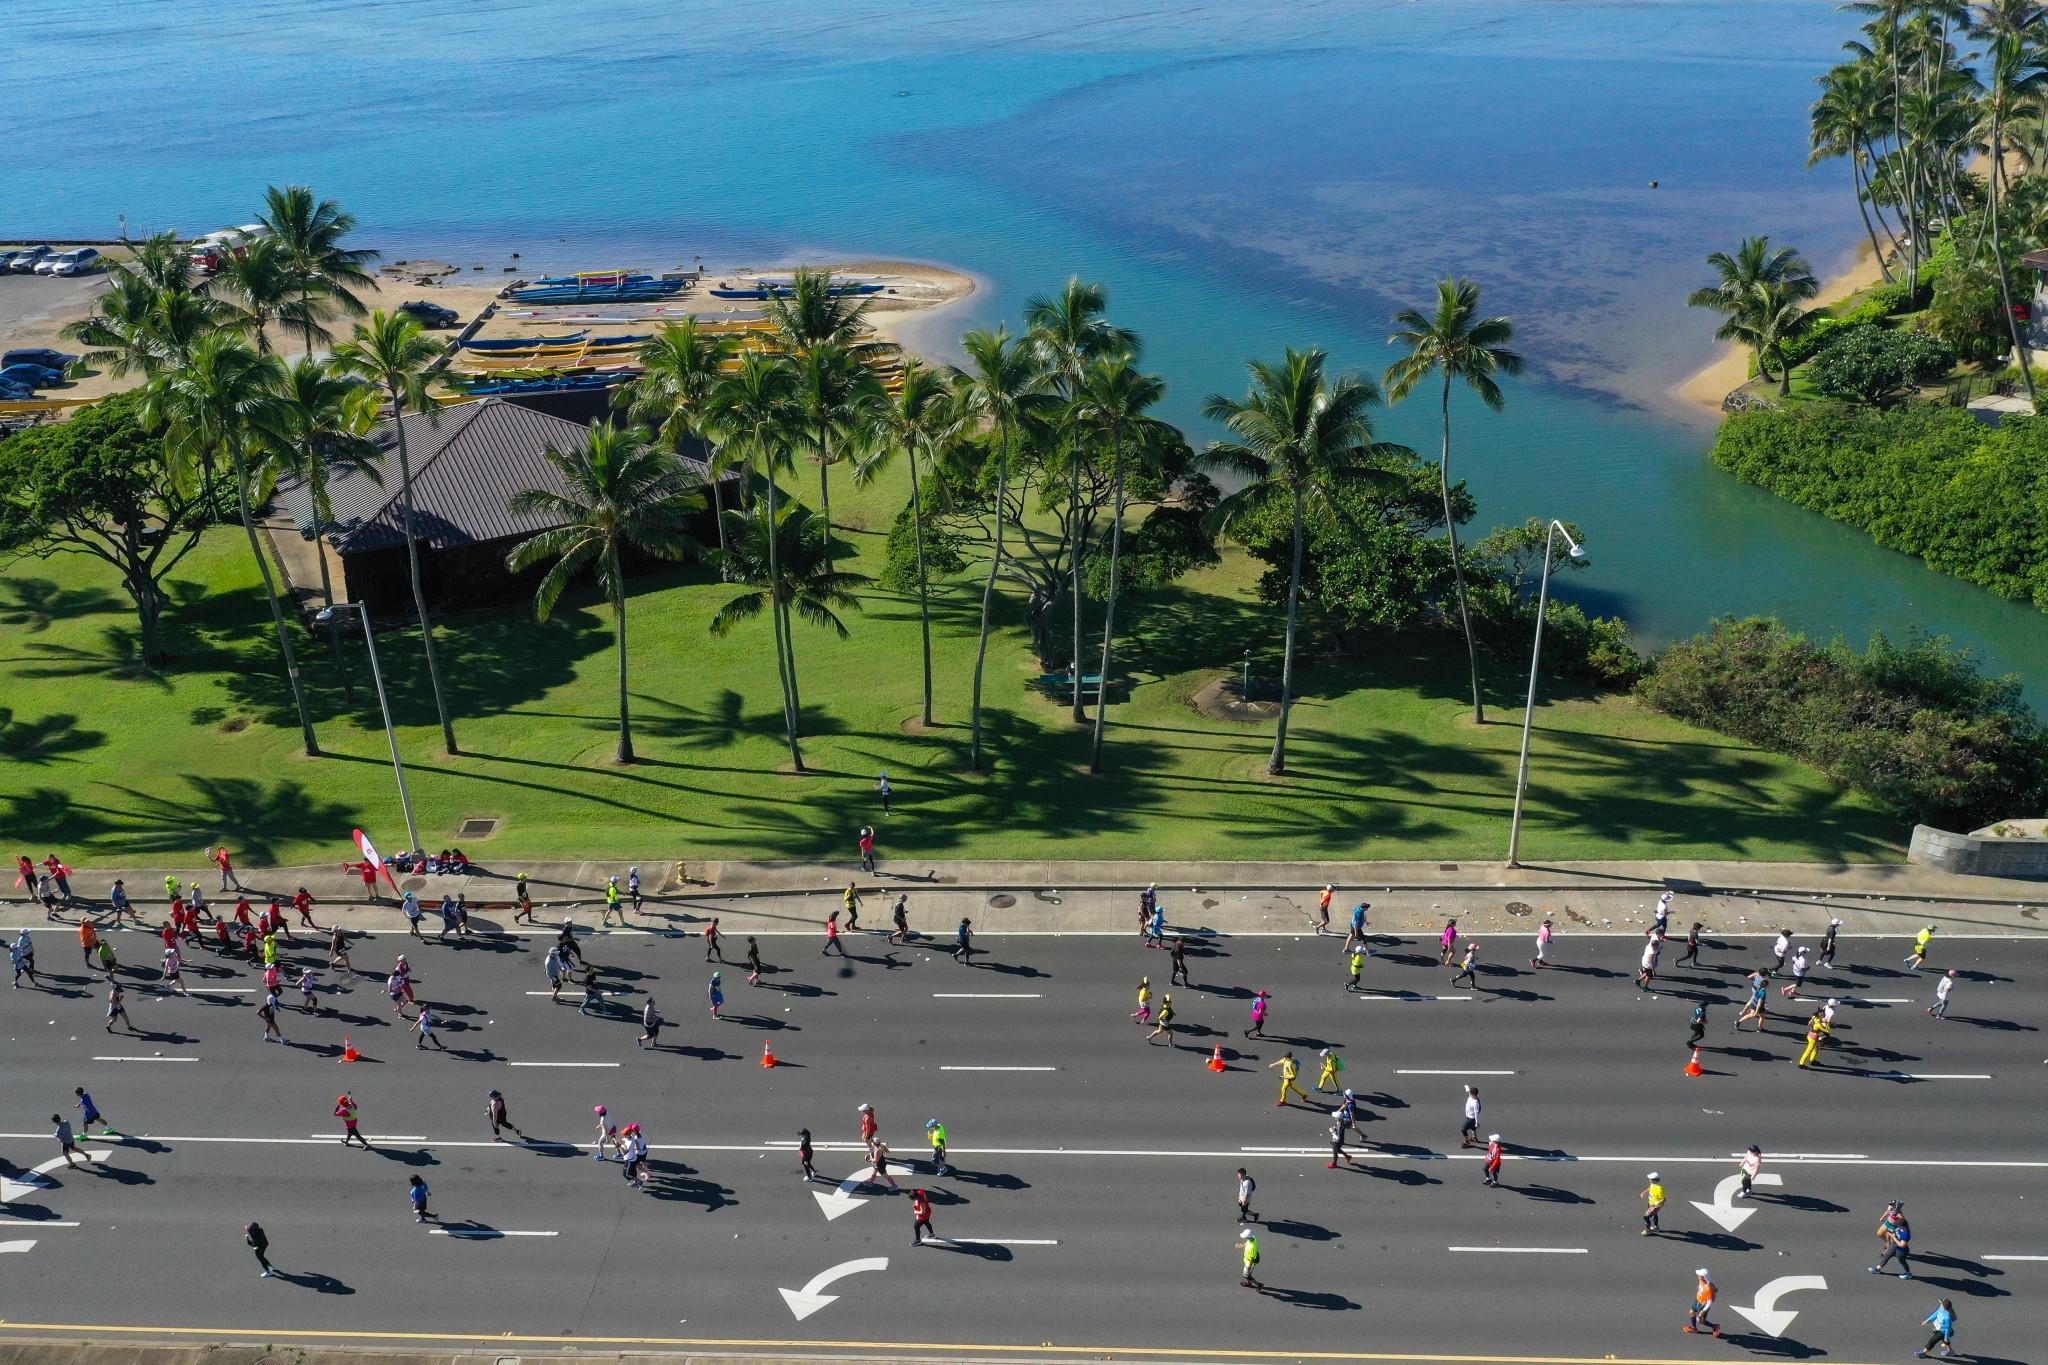 Honolulu Marathon latest race cancelled due to coronavirus